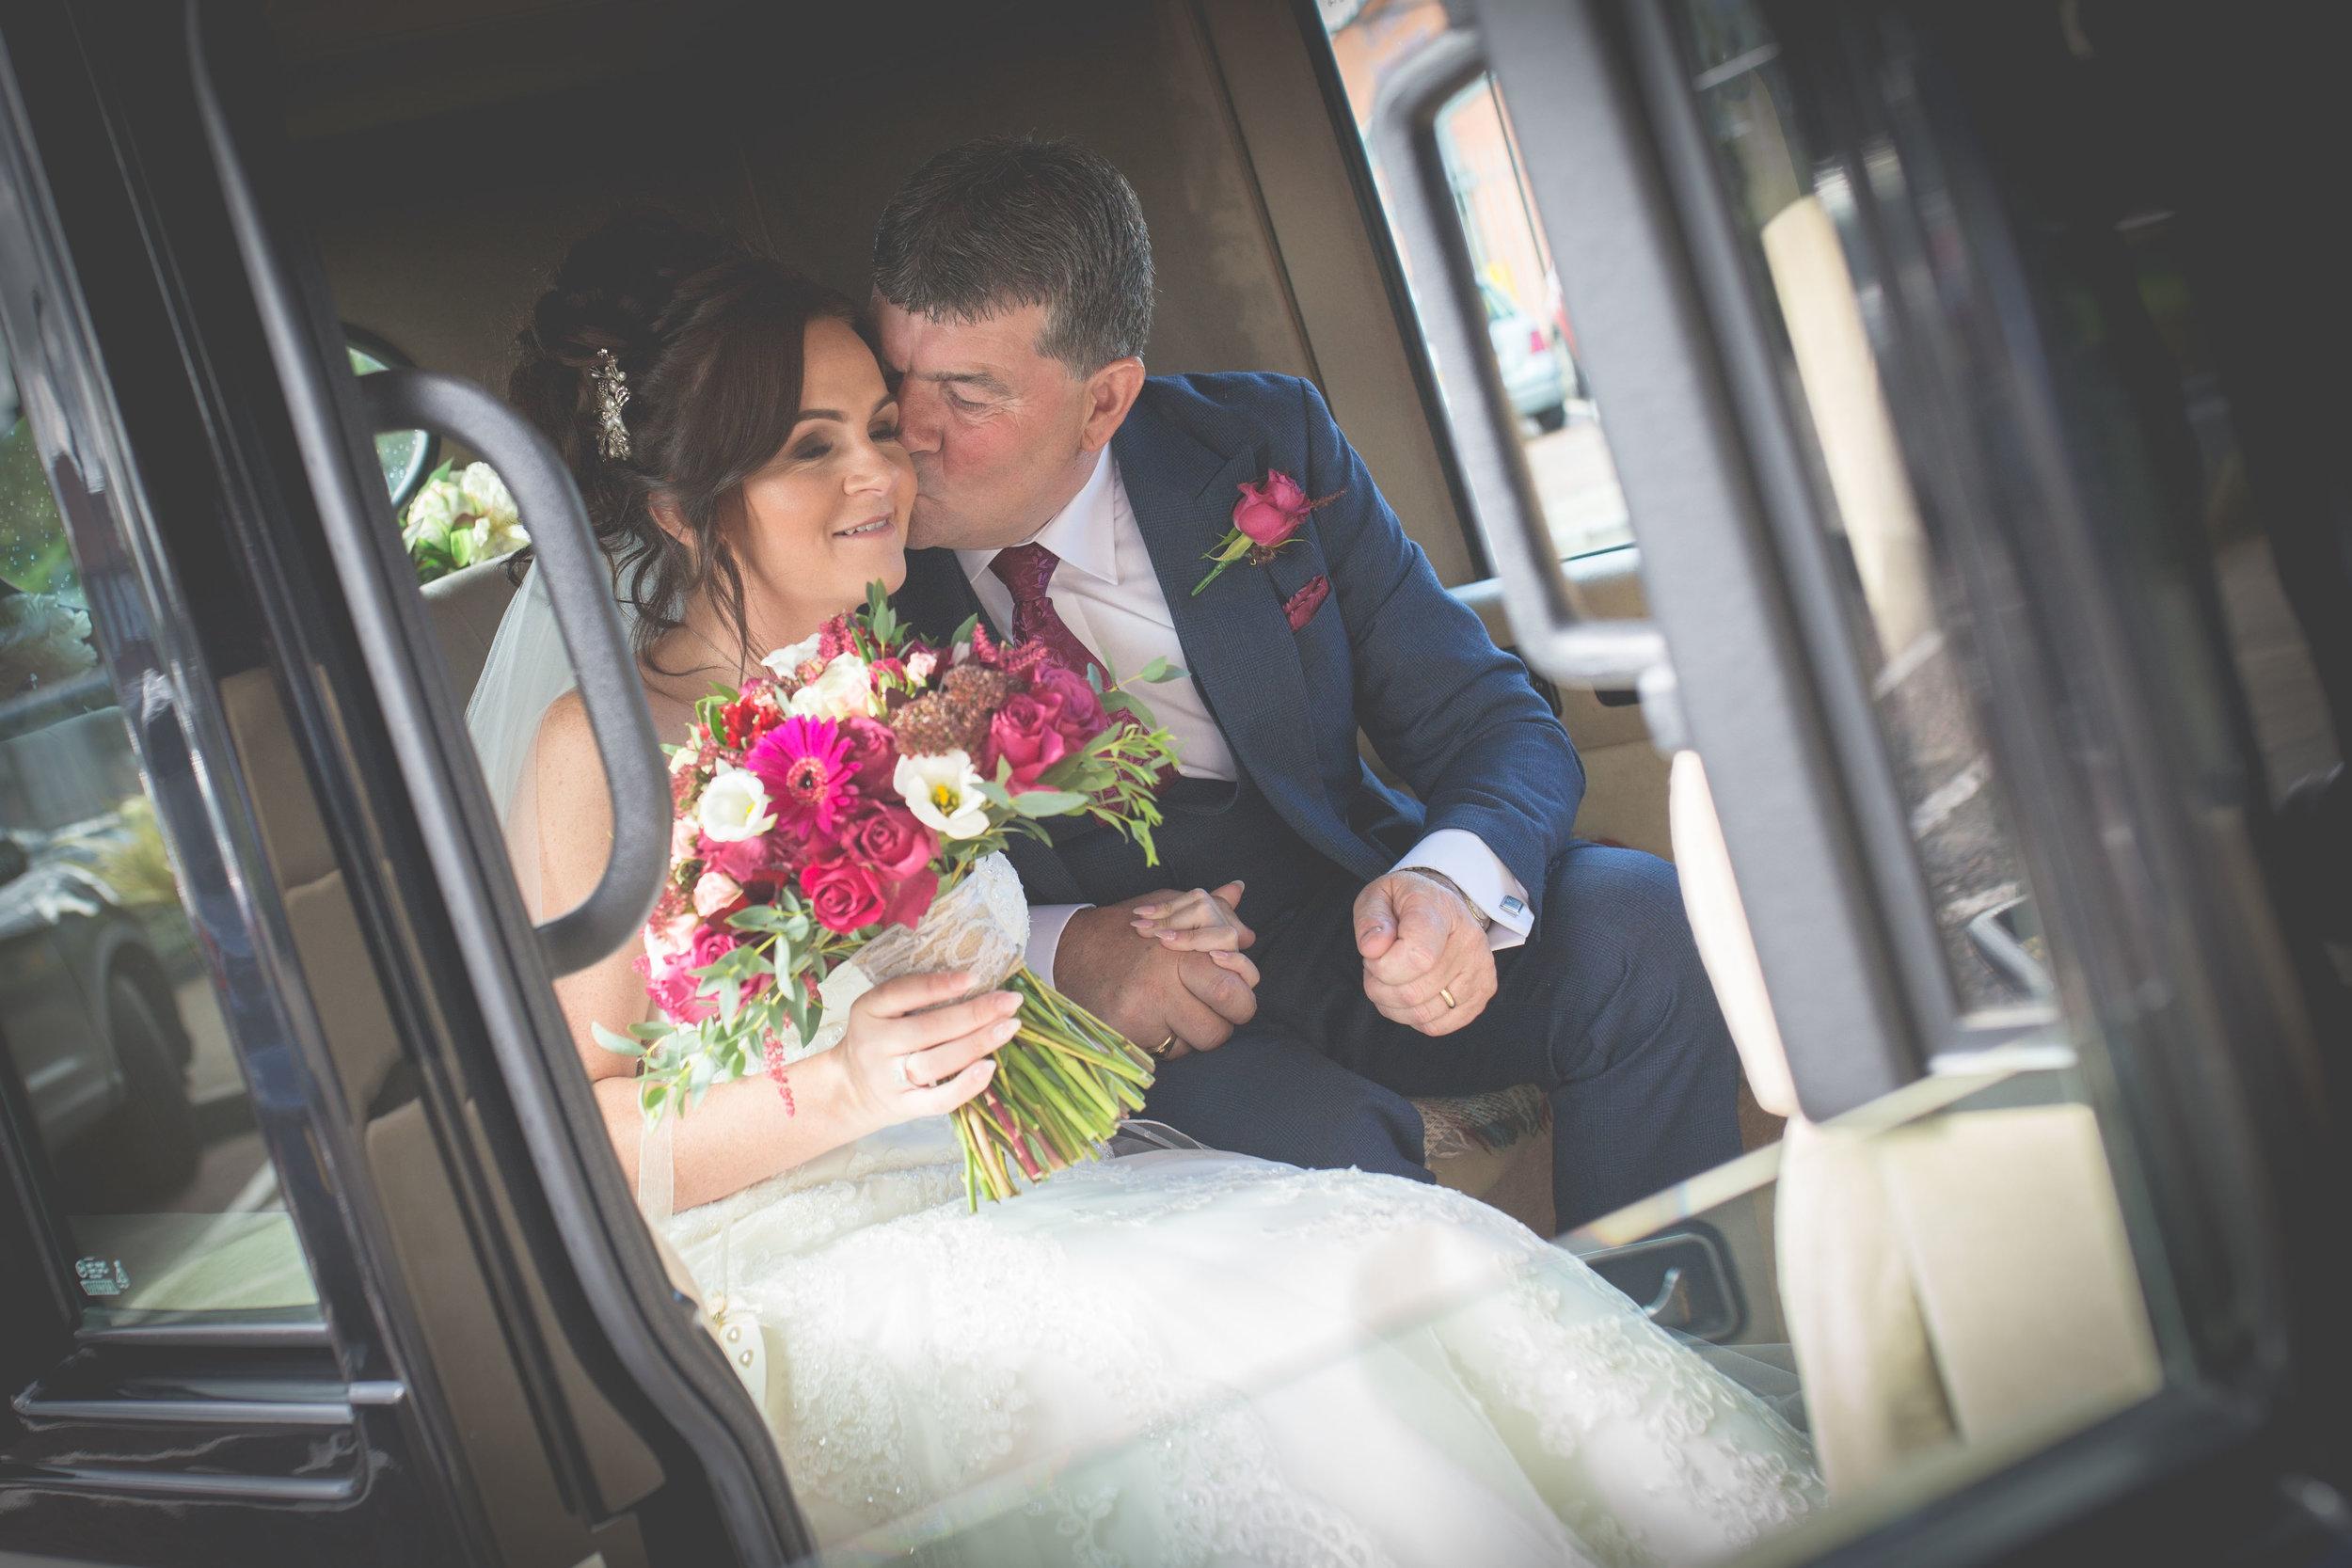 Northern Ireland Wedding Photographer | Brian McEwan Photography | Affordable Wedding Photography Throughout Antrim Down Armagh Tyrone Londonderry Derry Down Fermanagh -37.jpg